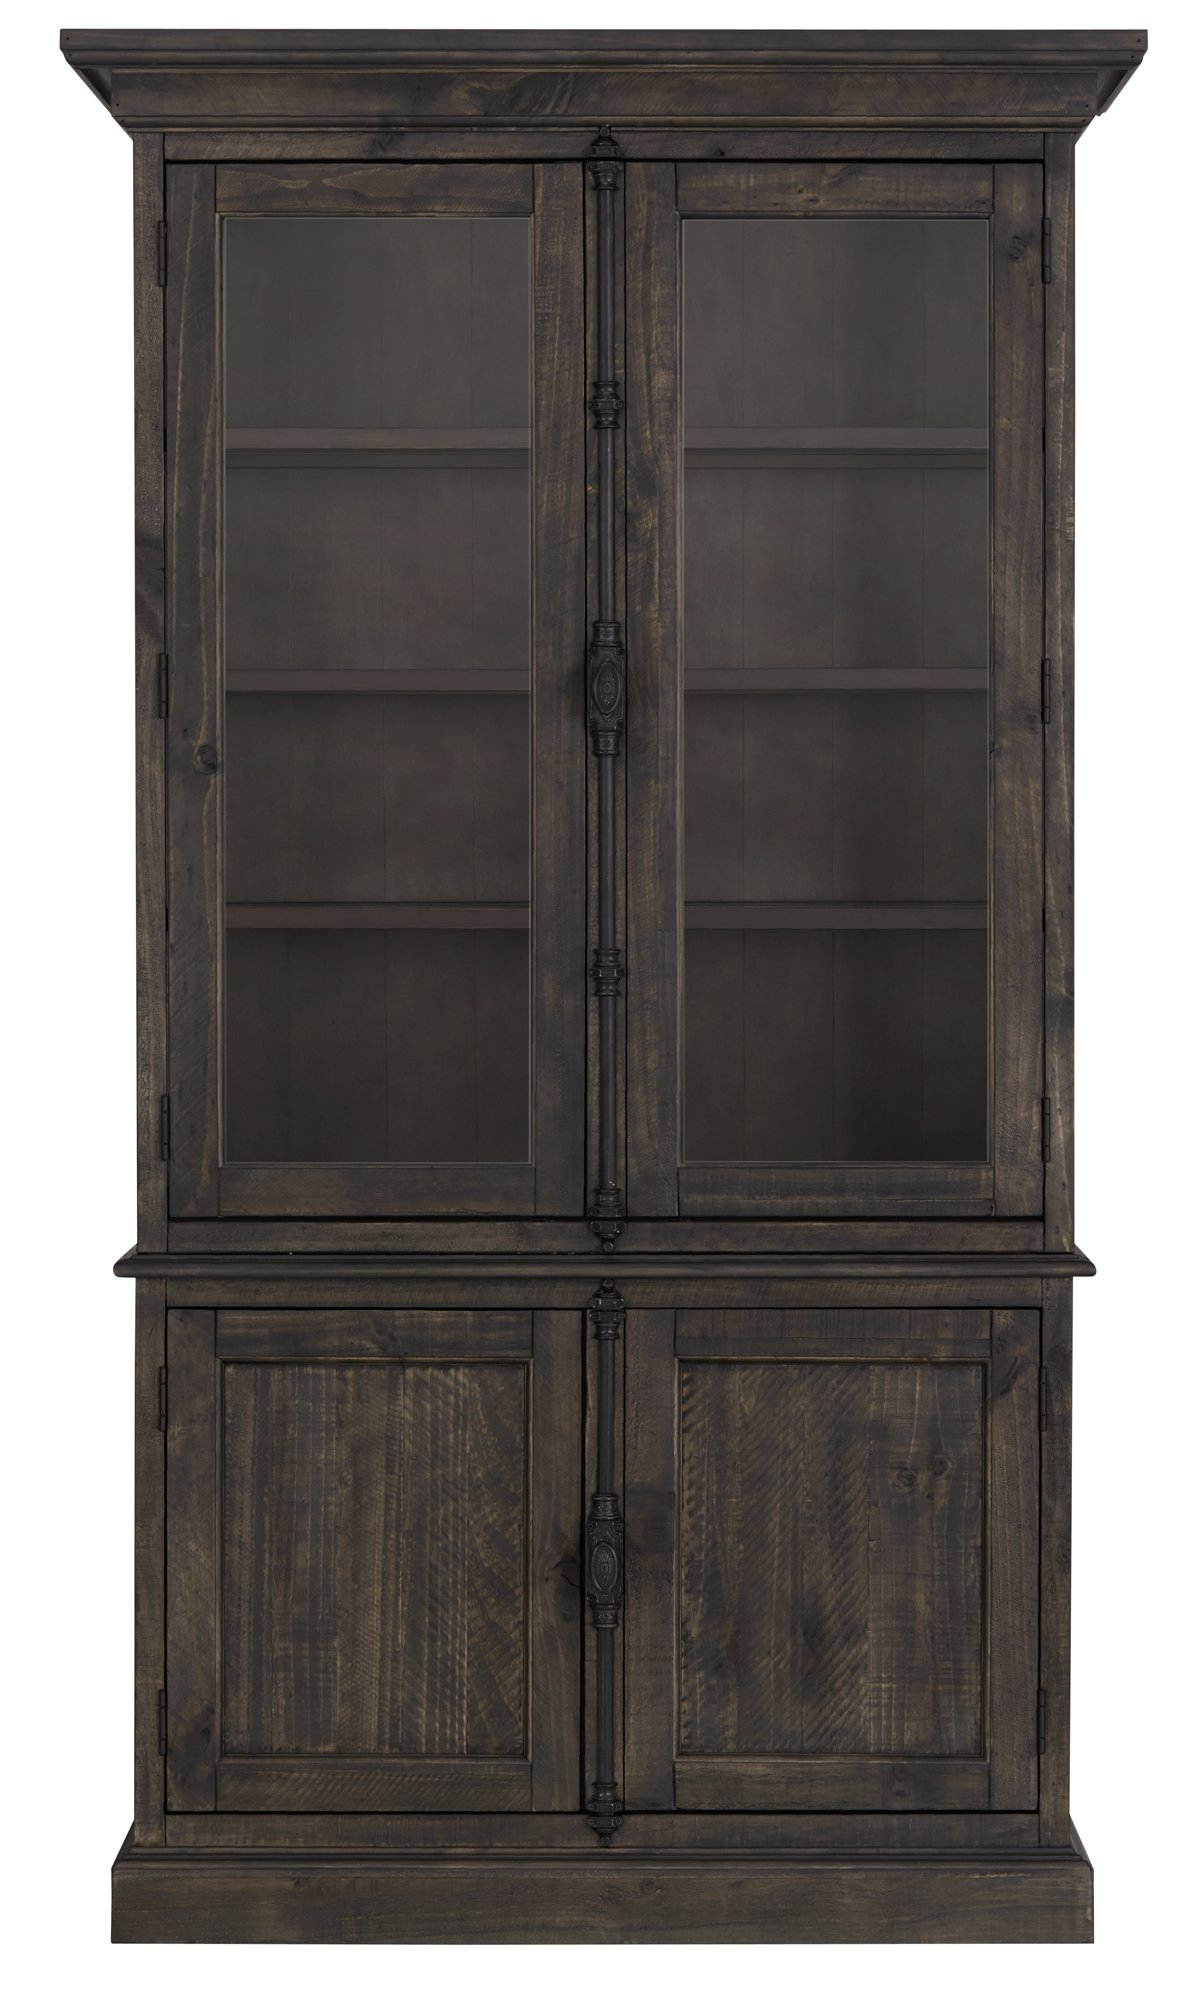 Sonoma Dark Tone Wood China Cabinet